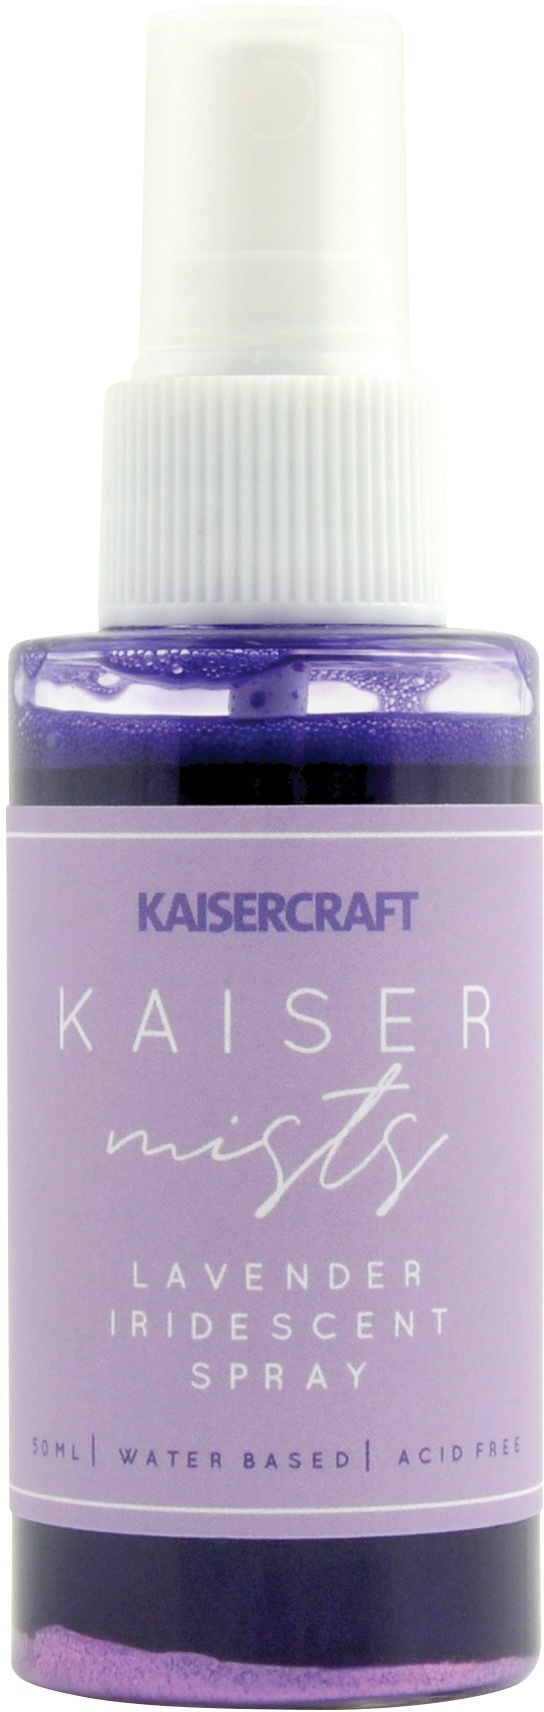 KaiserMists Iridescent Ink Spray 1.5oz-Lavender